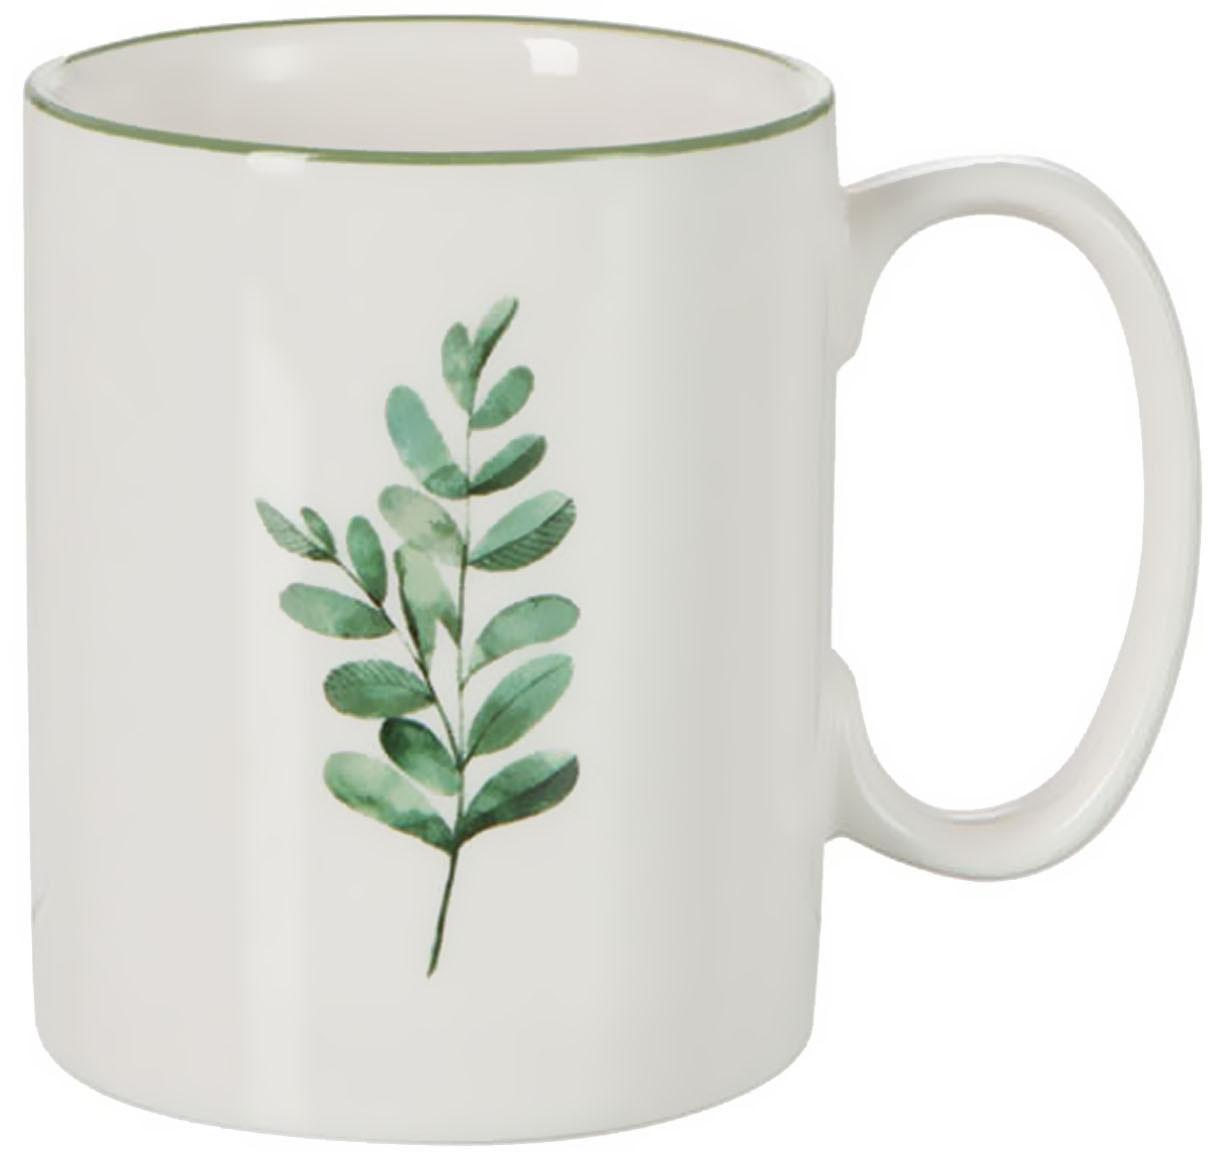 Mokken Eukalyptus, 6 stuks, Porselein, Wit, groen, Ø 8 x H 10 cm